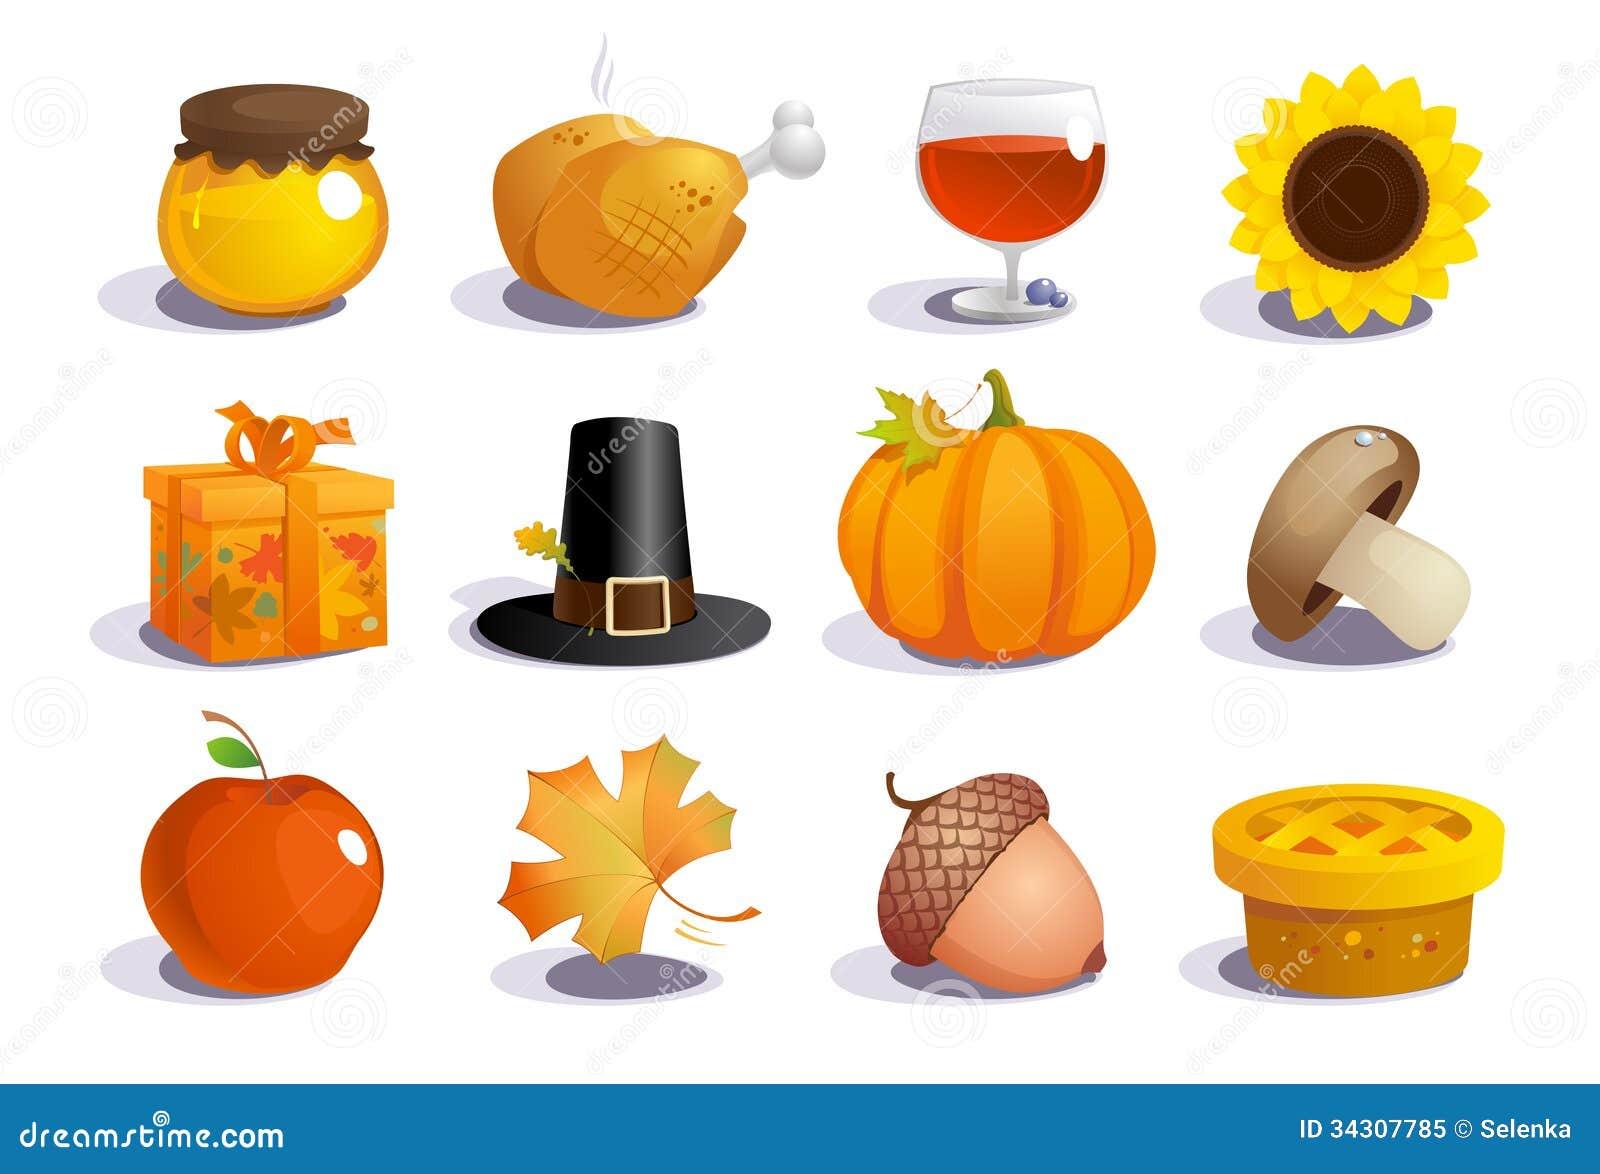 Thanksgiving Day Symbols Royalty Free Stock Photo Image